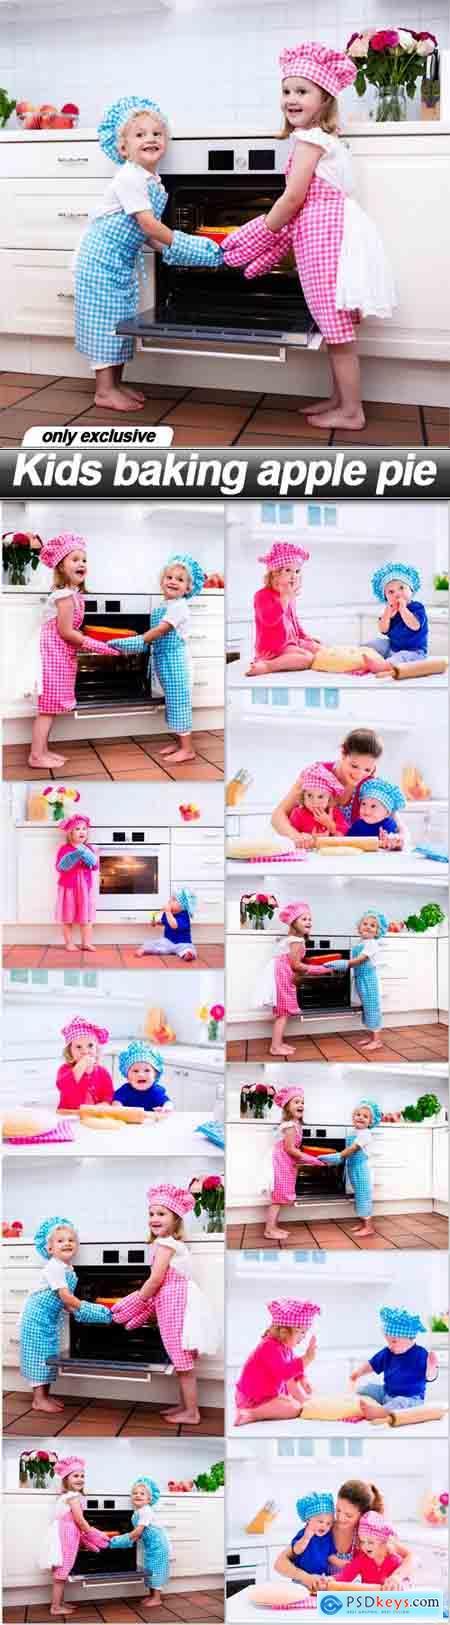 Kids baking apple pie - 11 UHQ JPEG